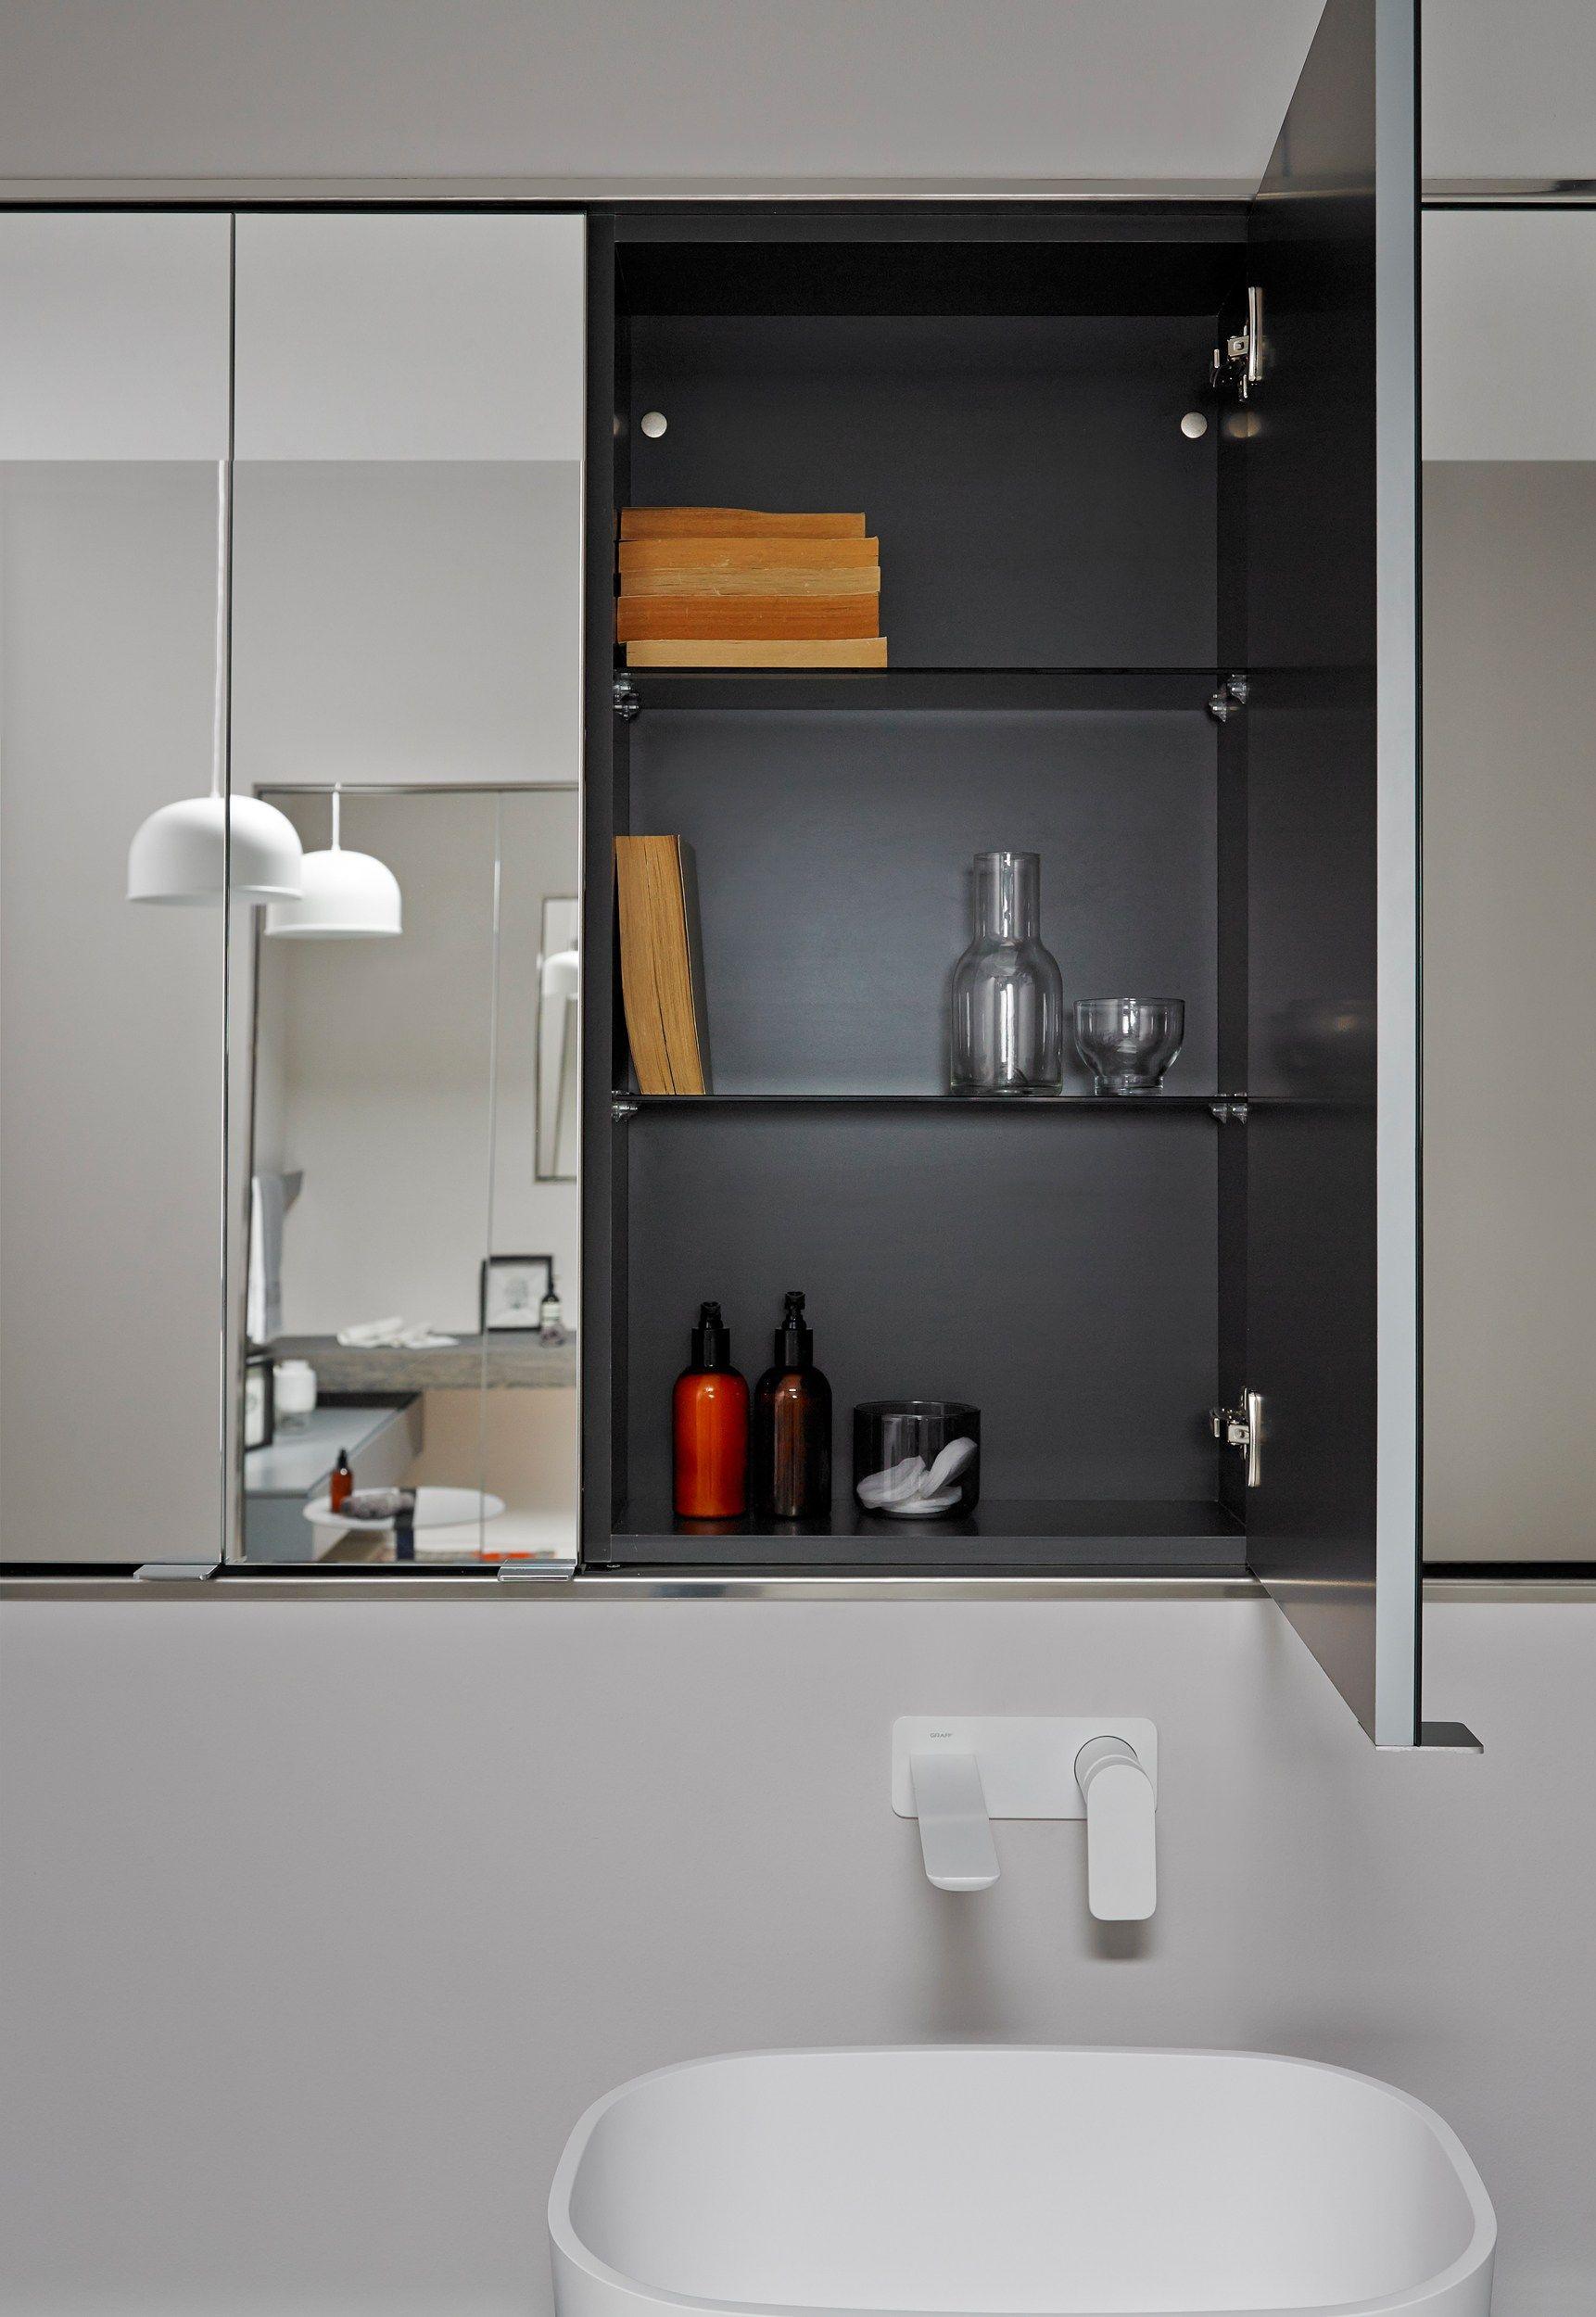 salle de bains compl te strato 09 by inbani. Black Bedroom Furniture Sets. Home Design Ideas